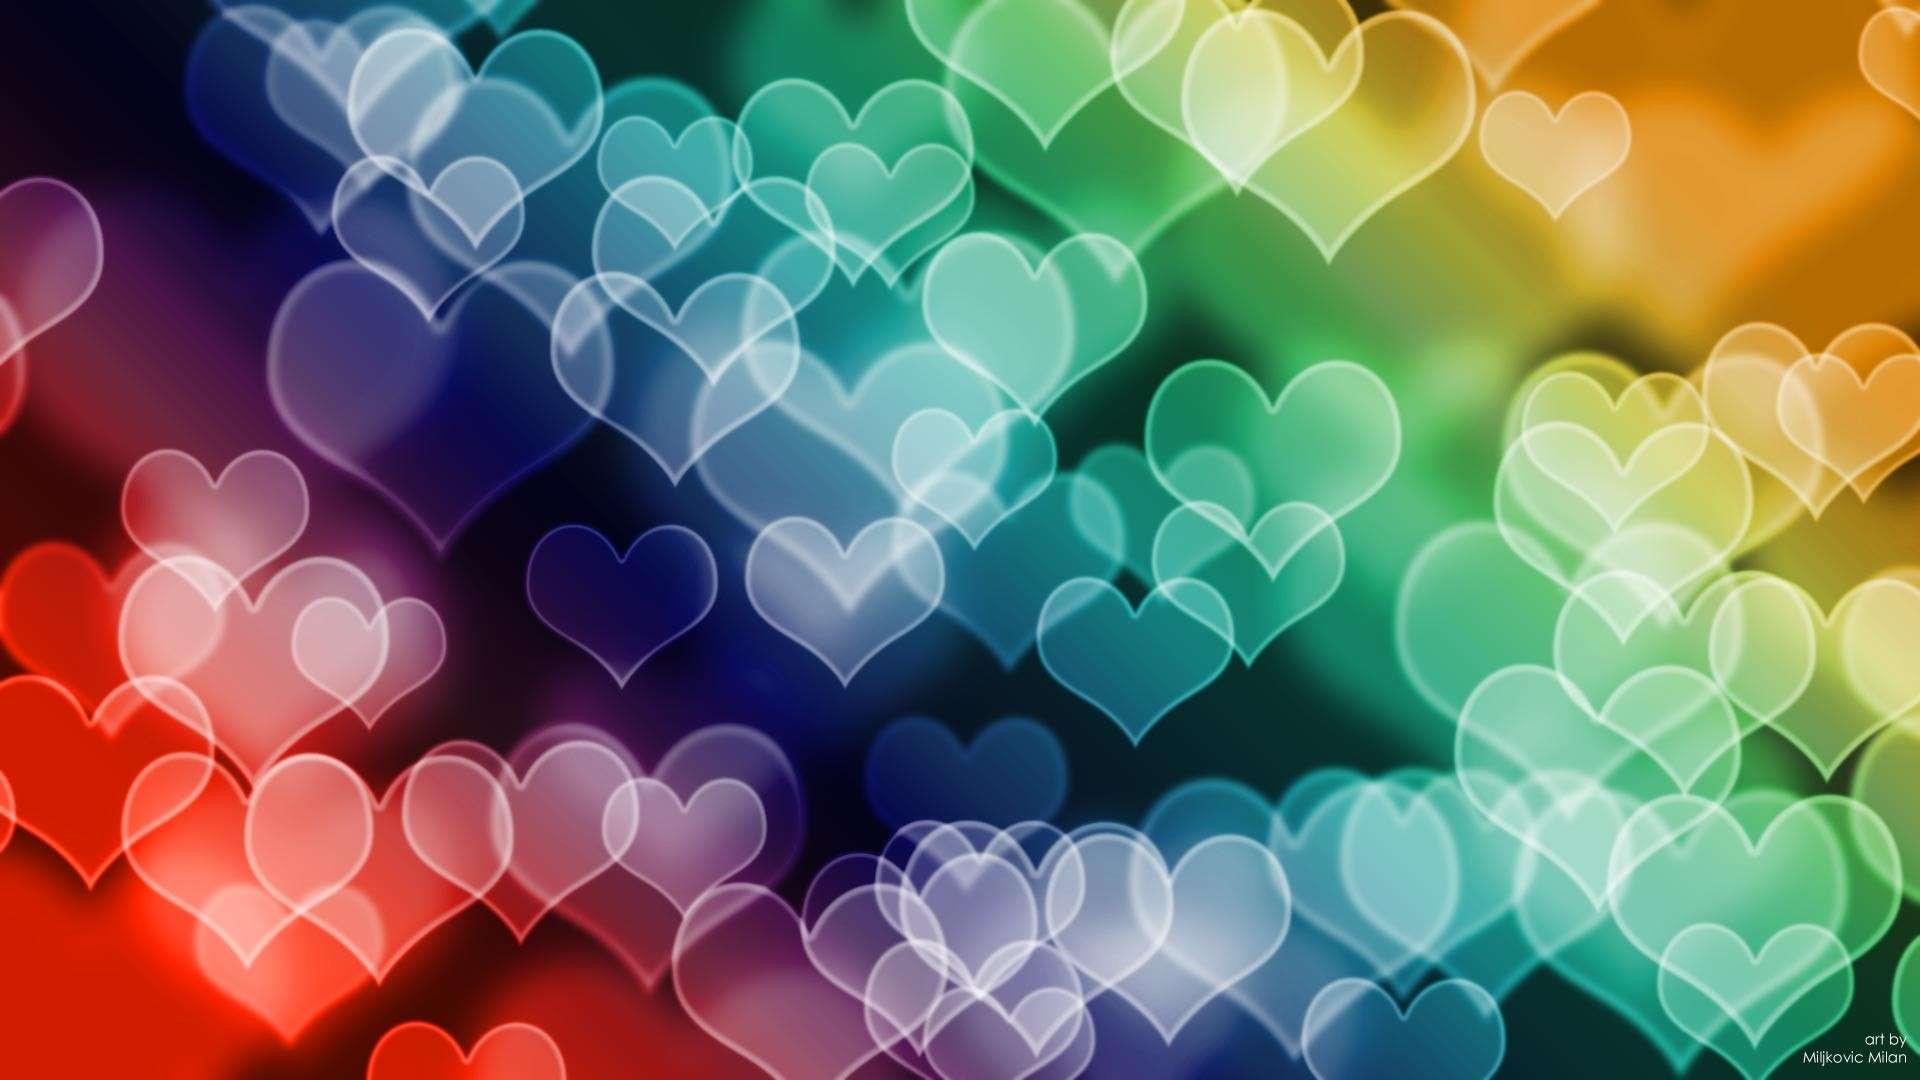 Colored-Hearts_www.FullHDWpp.com_